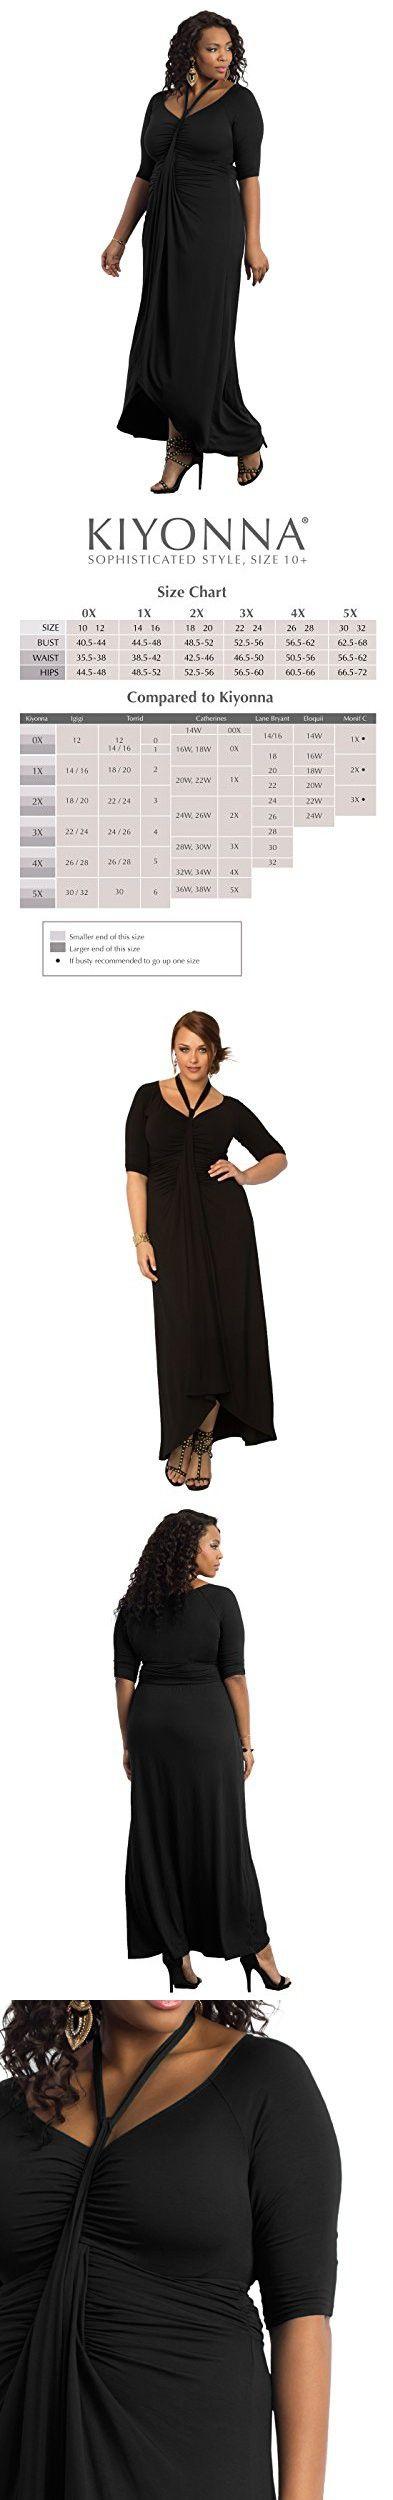 Kiyonna Women S Plus Size Divine Draped Maxi Dress 4x Black Noir Drape Maxi Dress Maxi Dress Casual Dresses [ 2500 x 393 Pixel ]